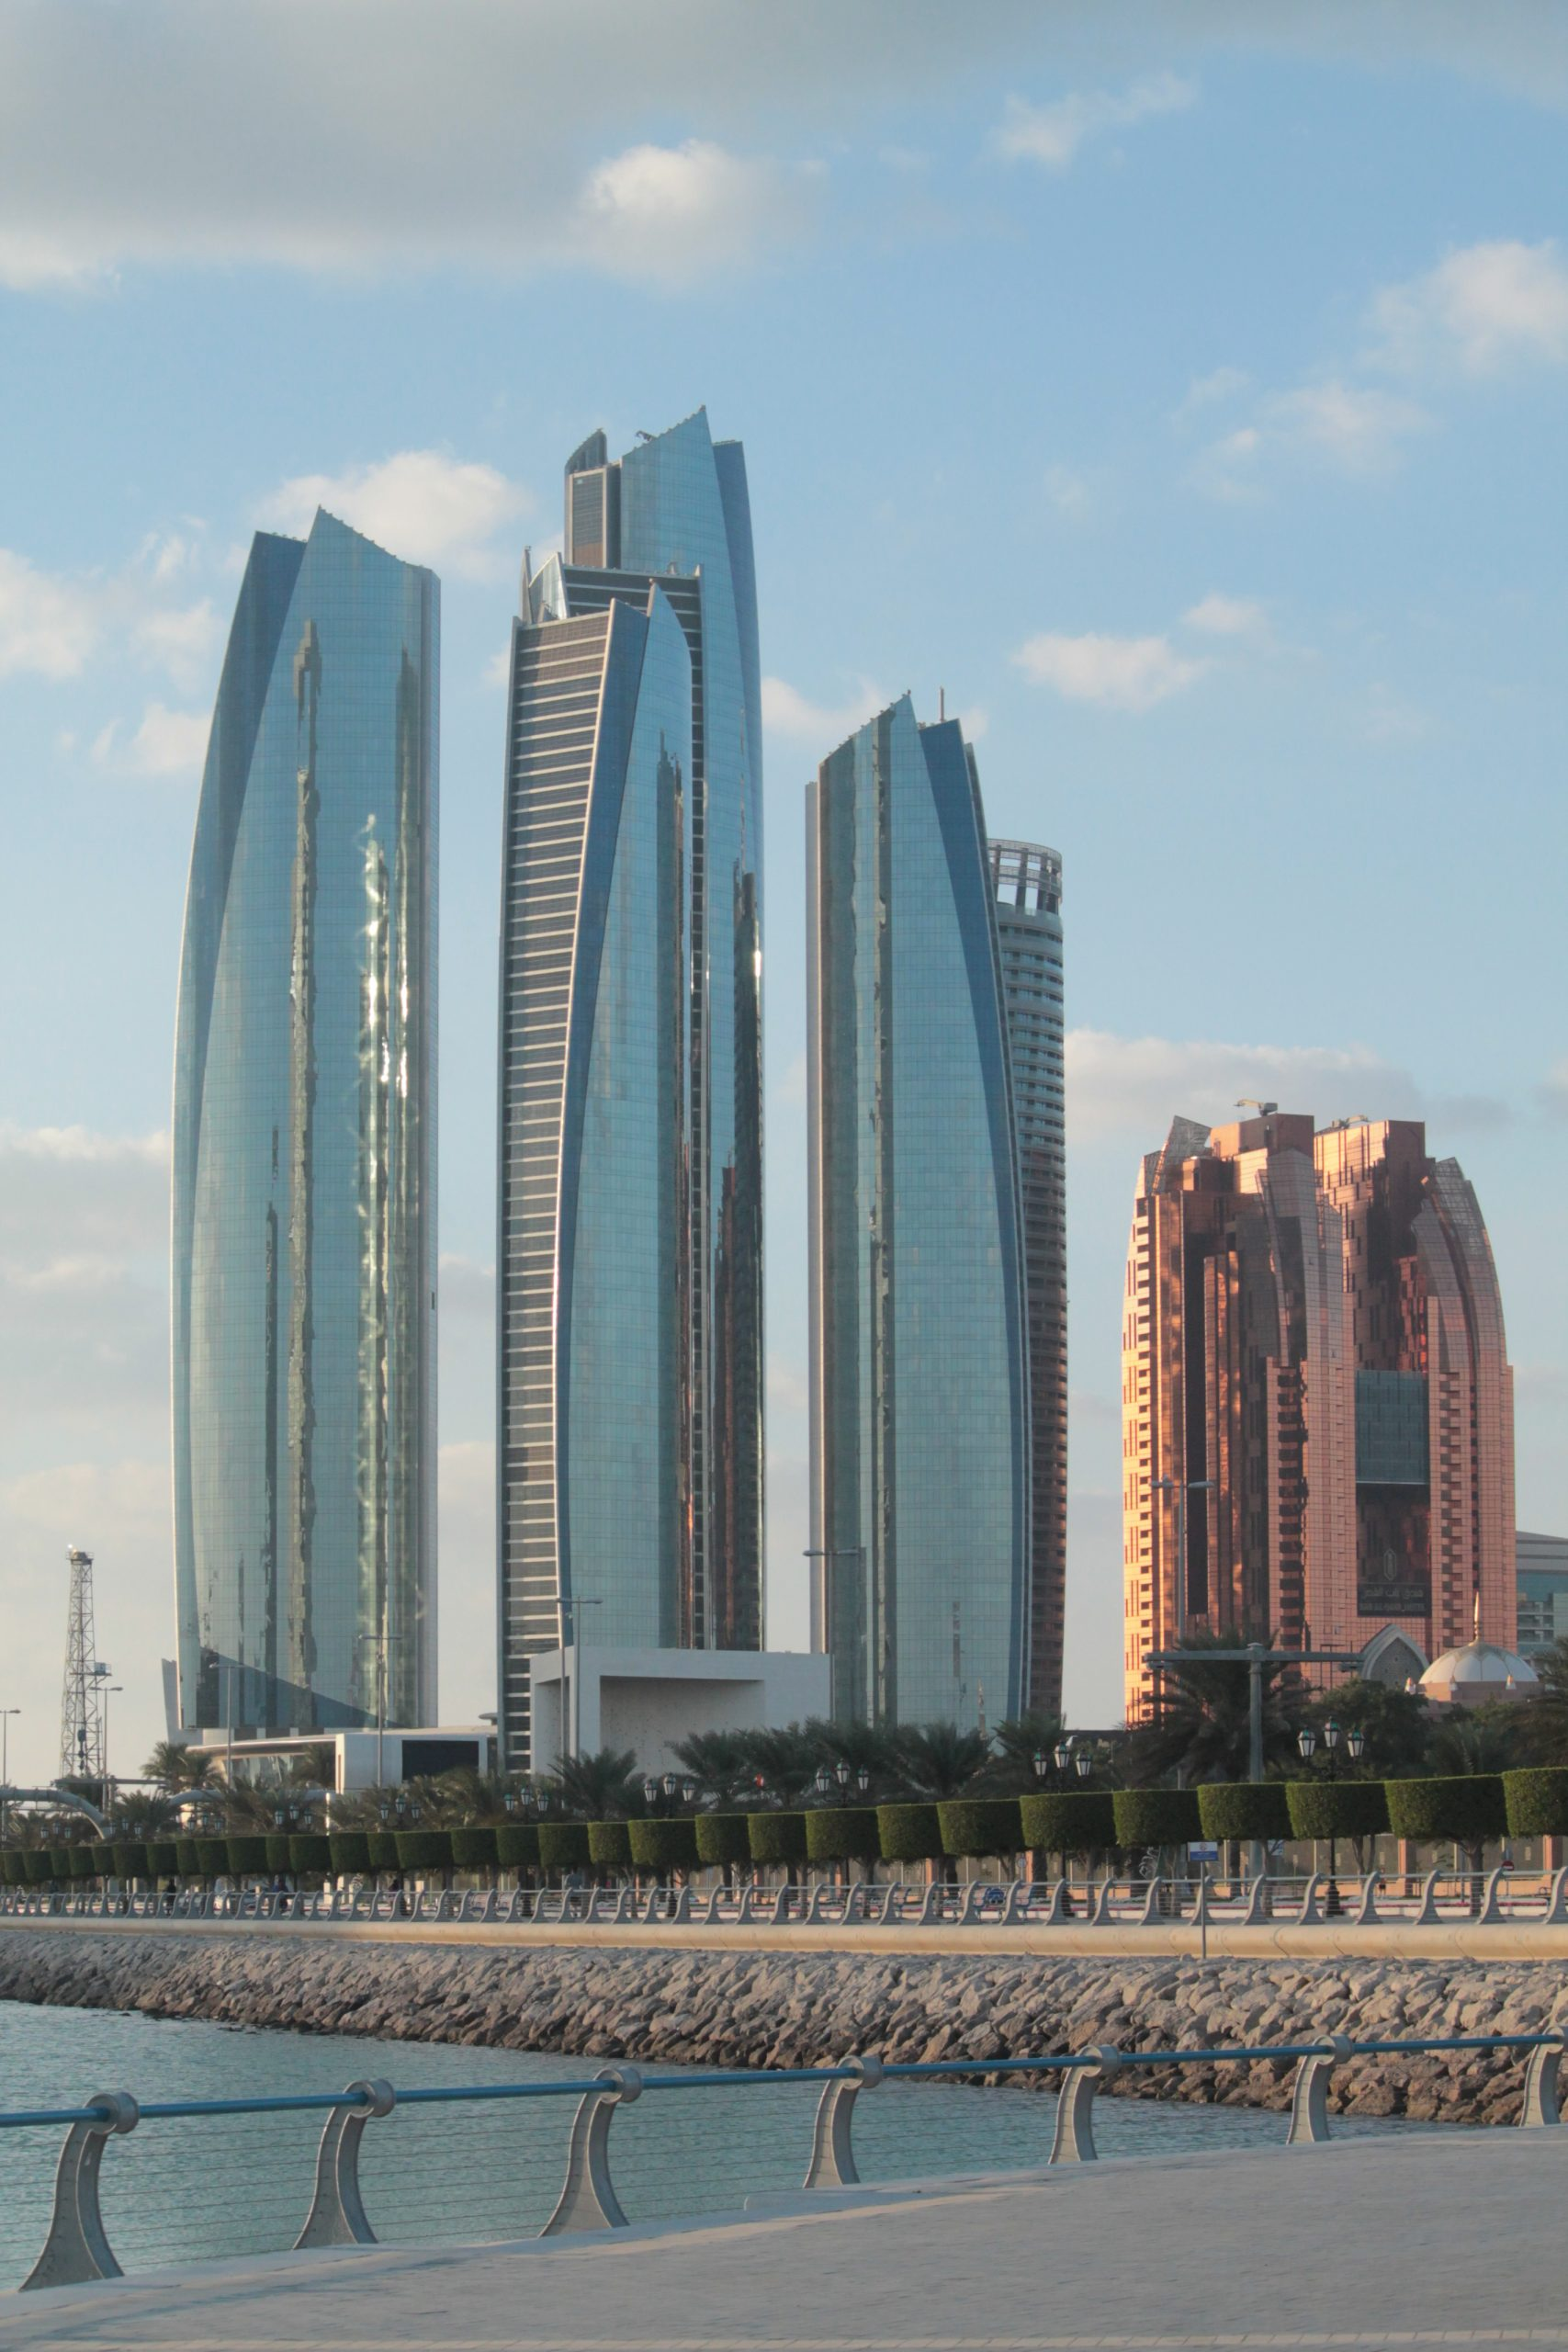 Building landscape in Dubai